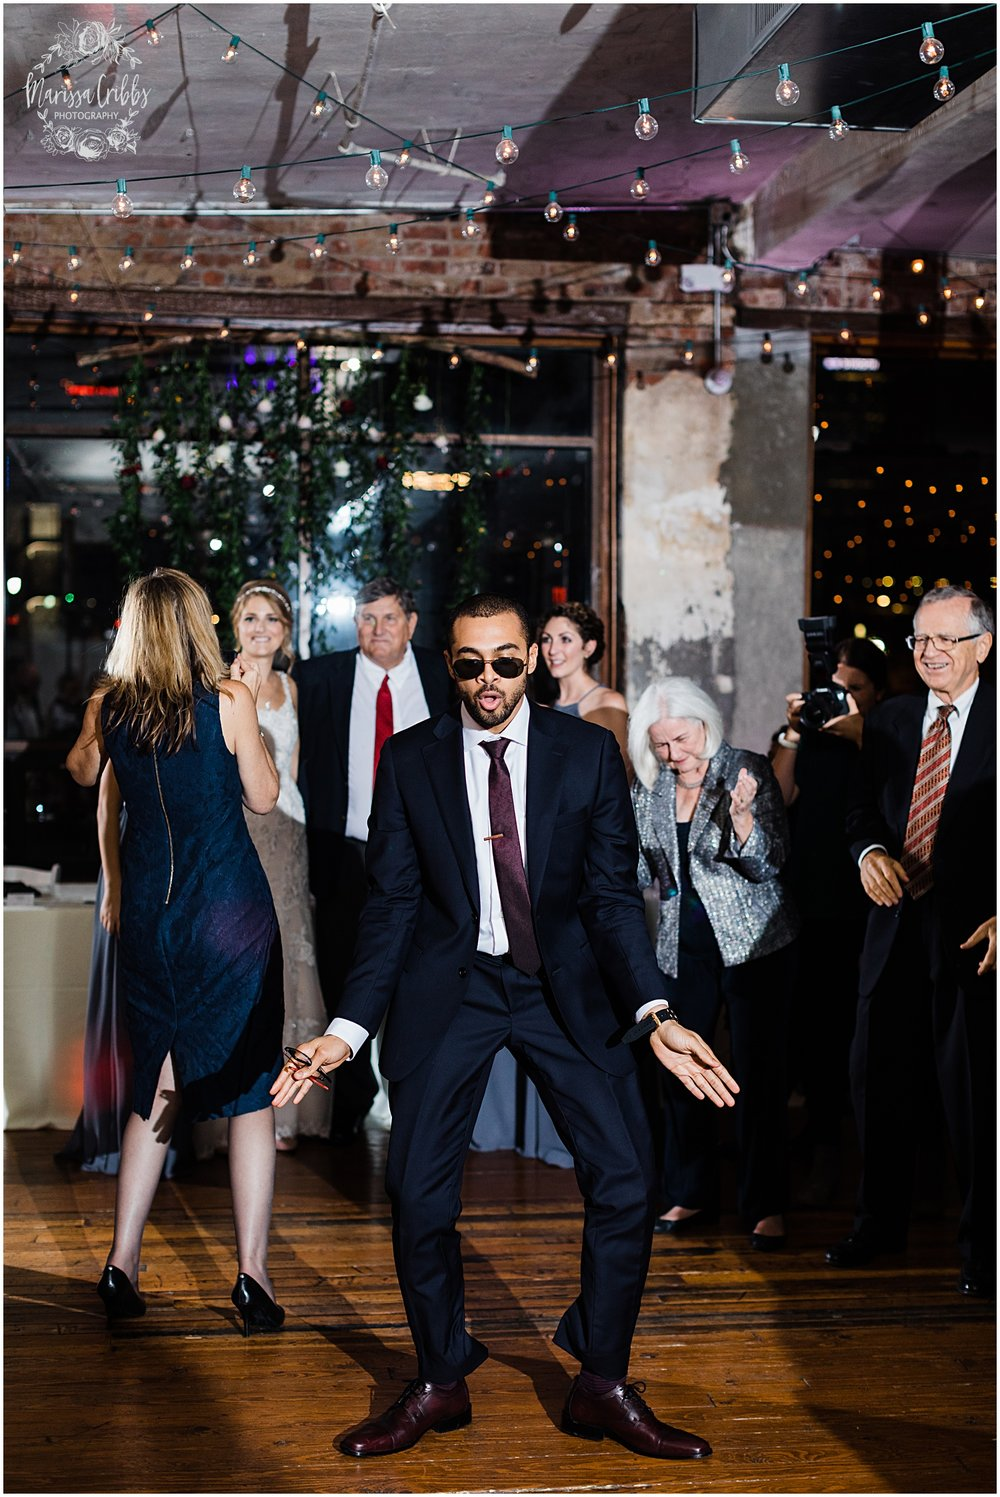 BAUER WEDDING | KELSEA & JUSTIN | MARISSA CRIBBS PHOTOGRAPHY_6611.jpg